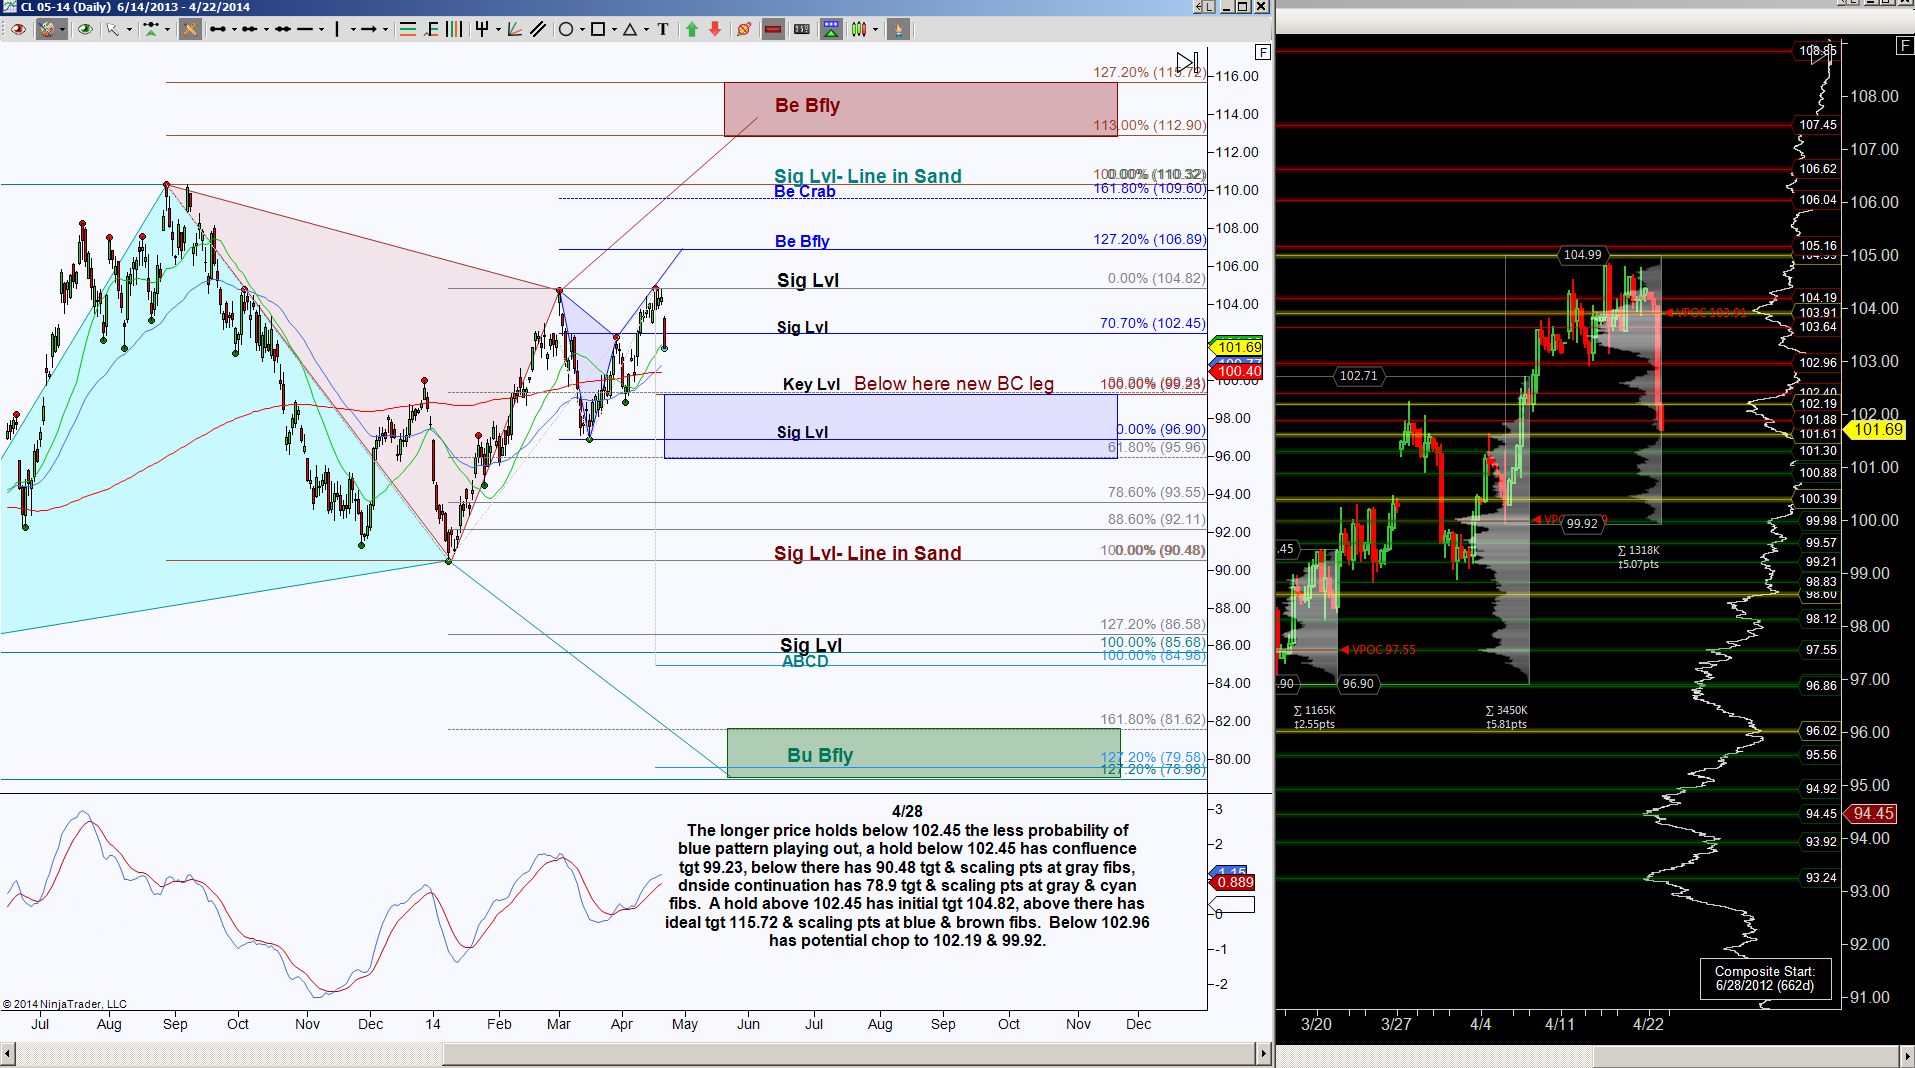 Options trading scenarios